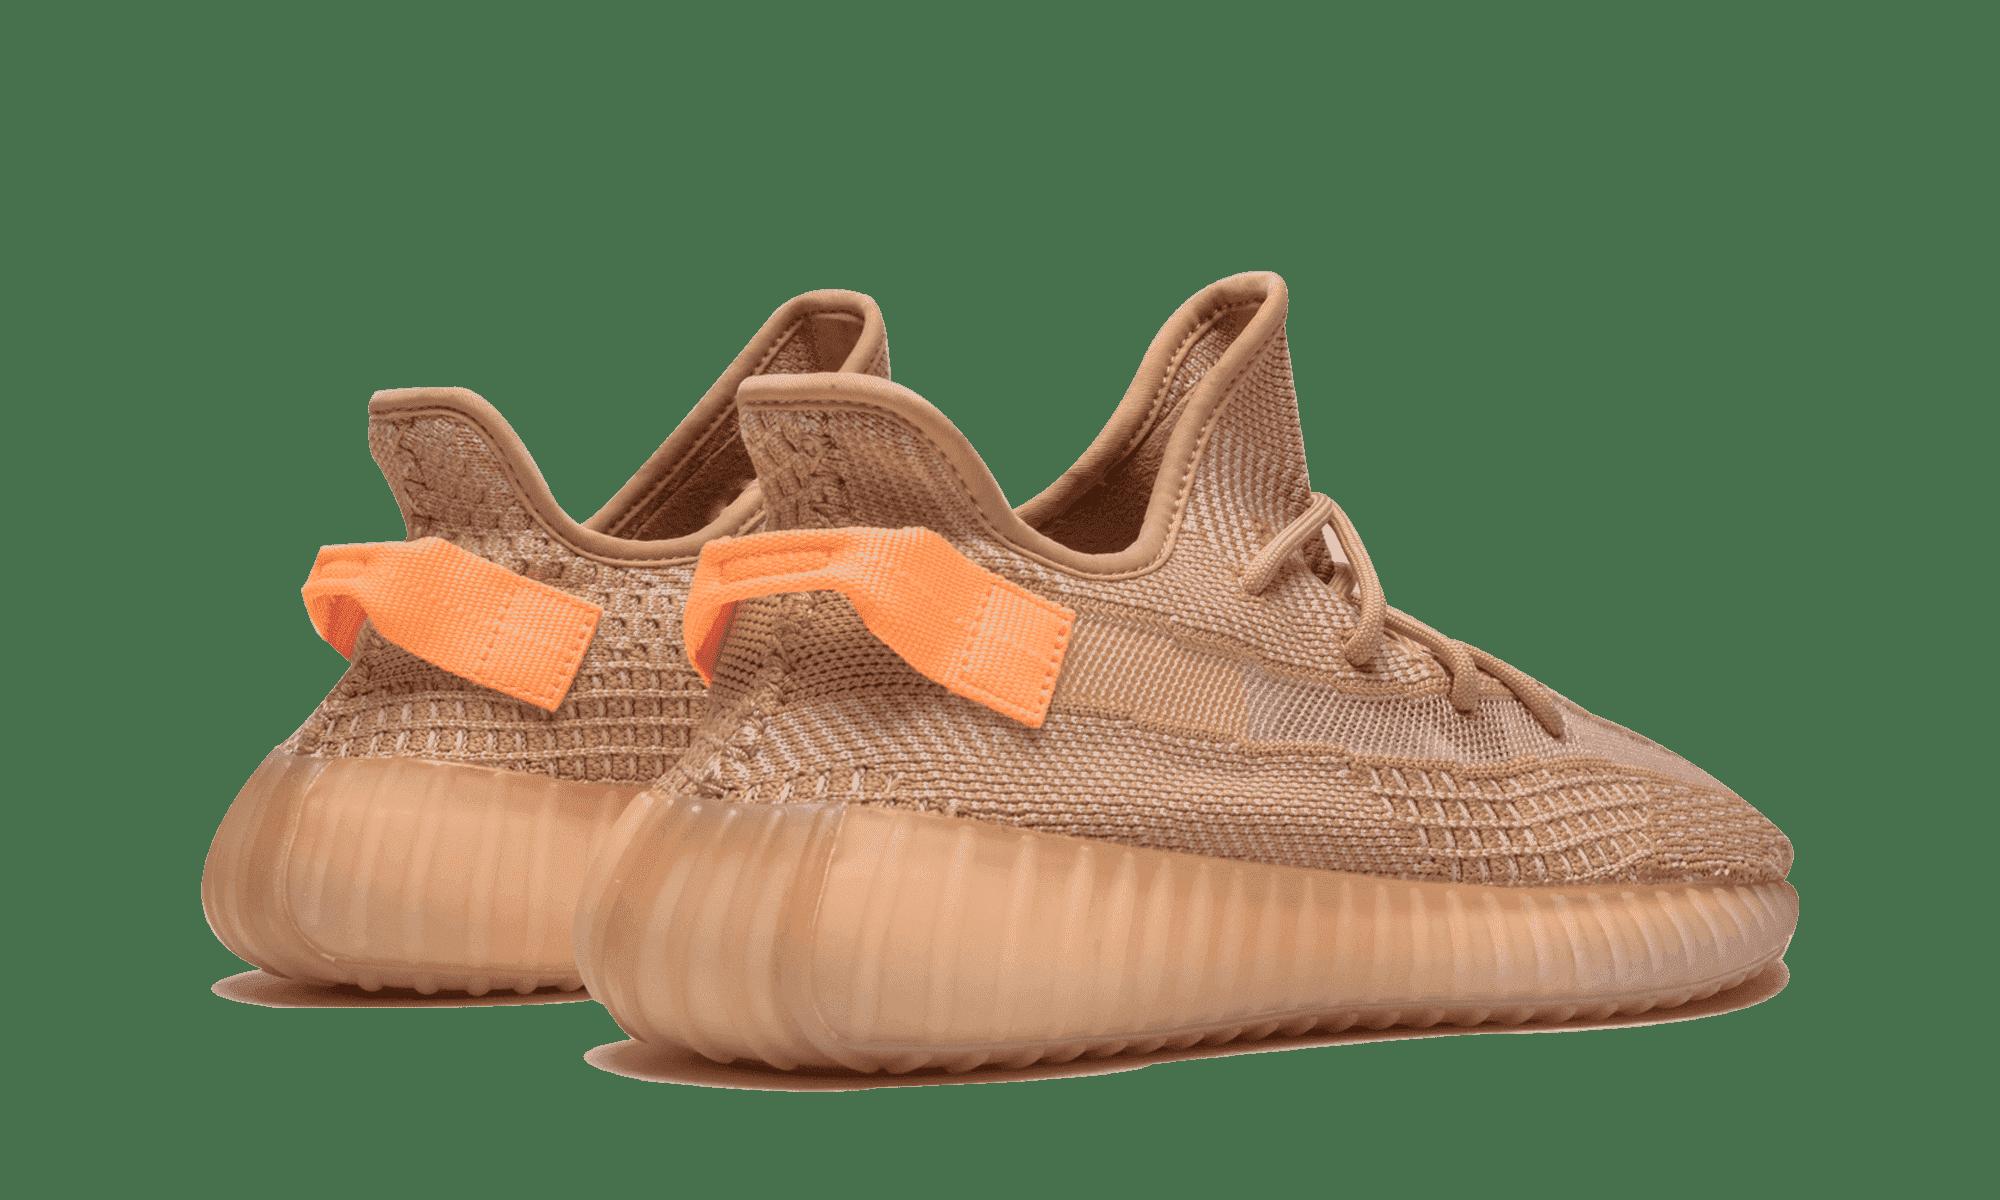 Adidas Yeezy Boost 350 V2 Clay - Yeezy